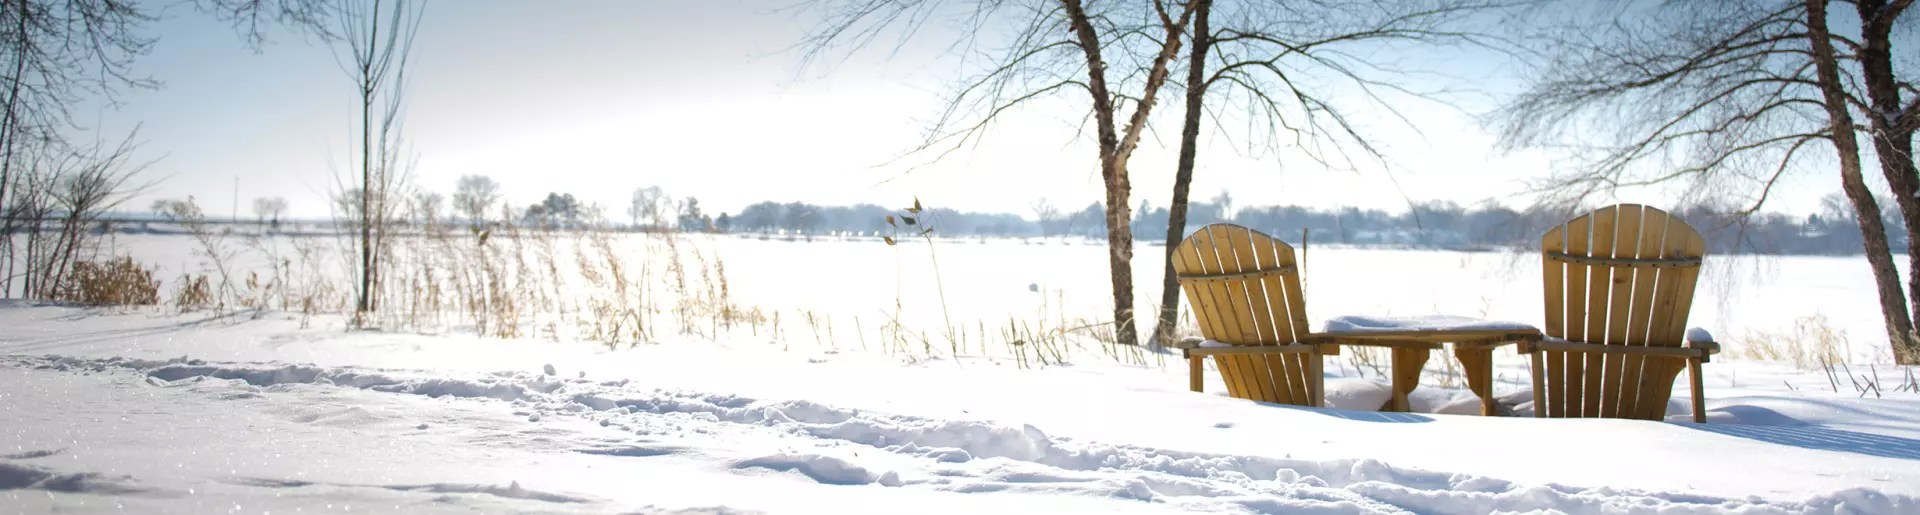 Madison Winter Wonderland Itinerary